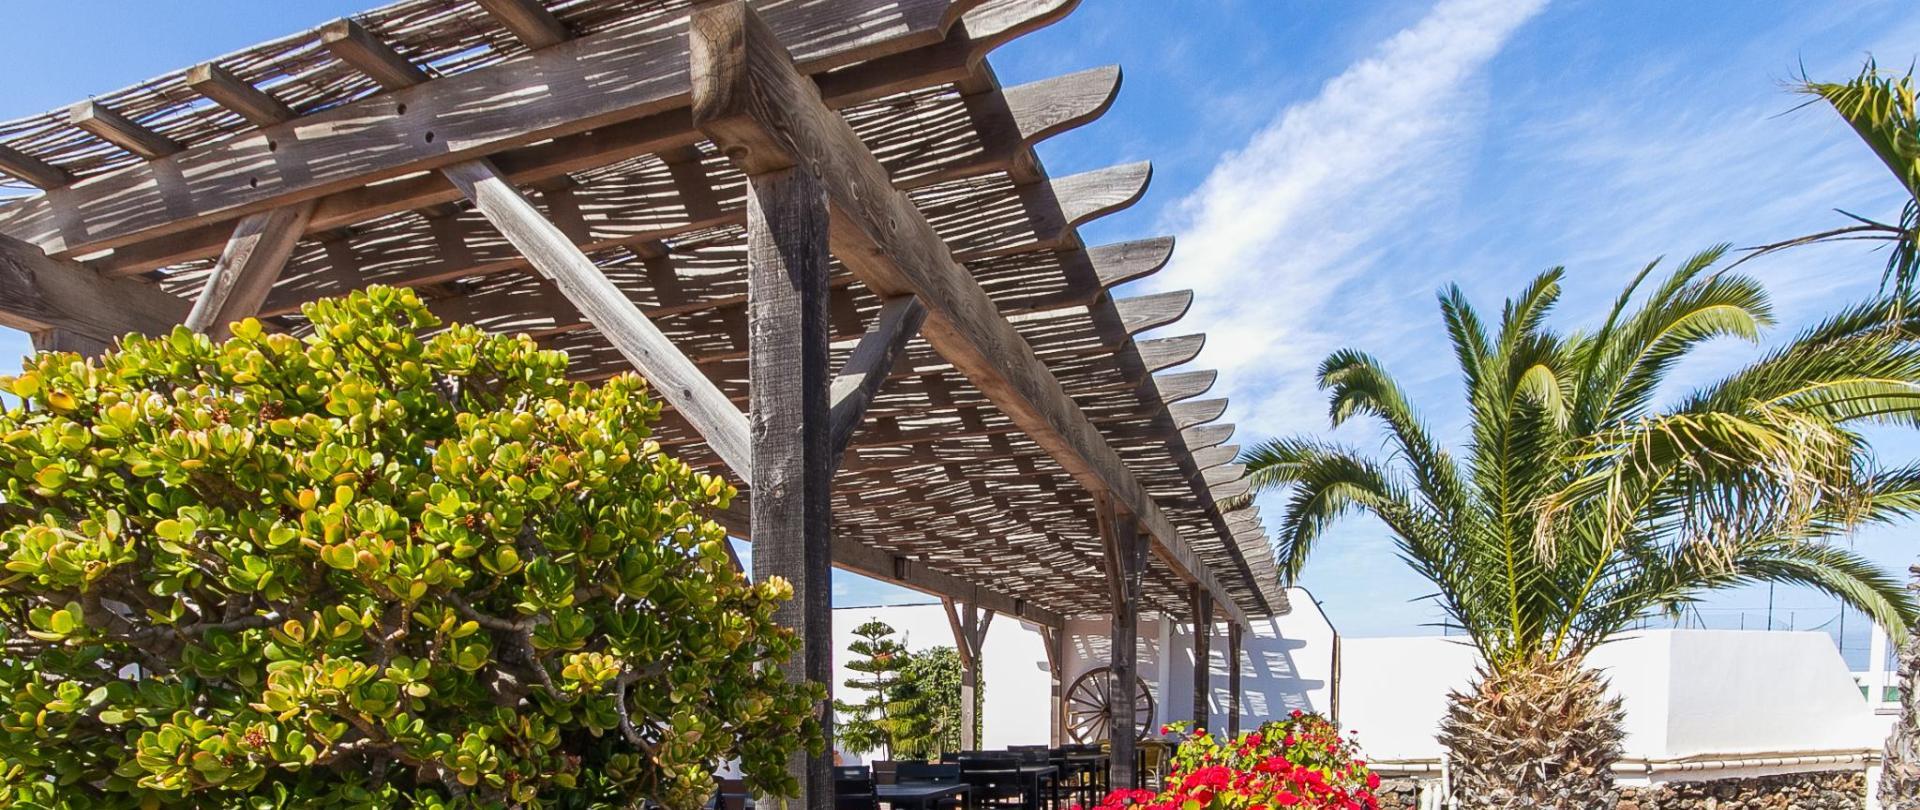 La Hacienda Restaurant Terrace.jpg